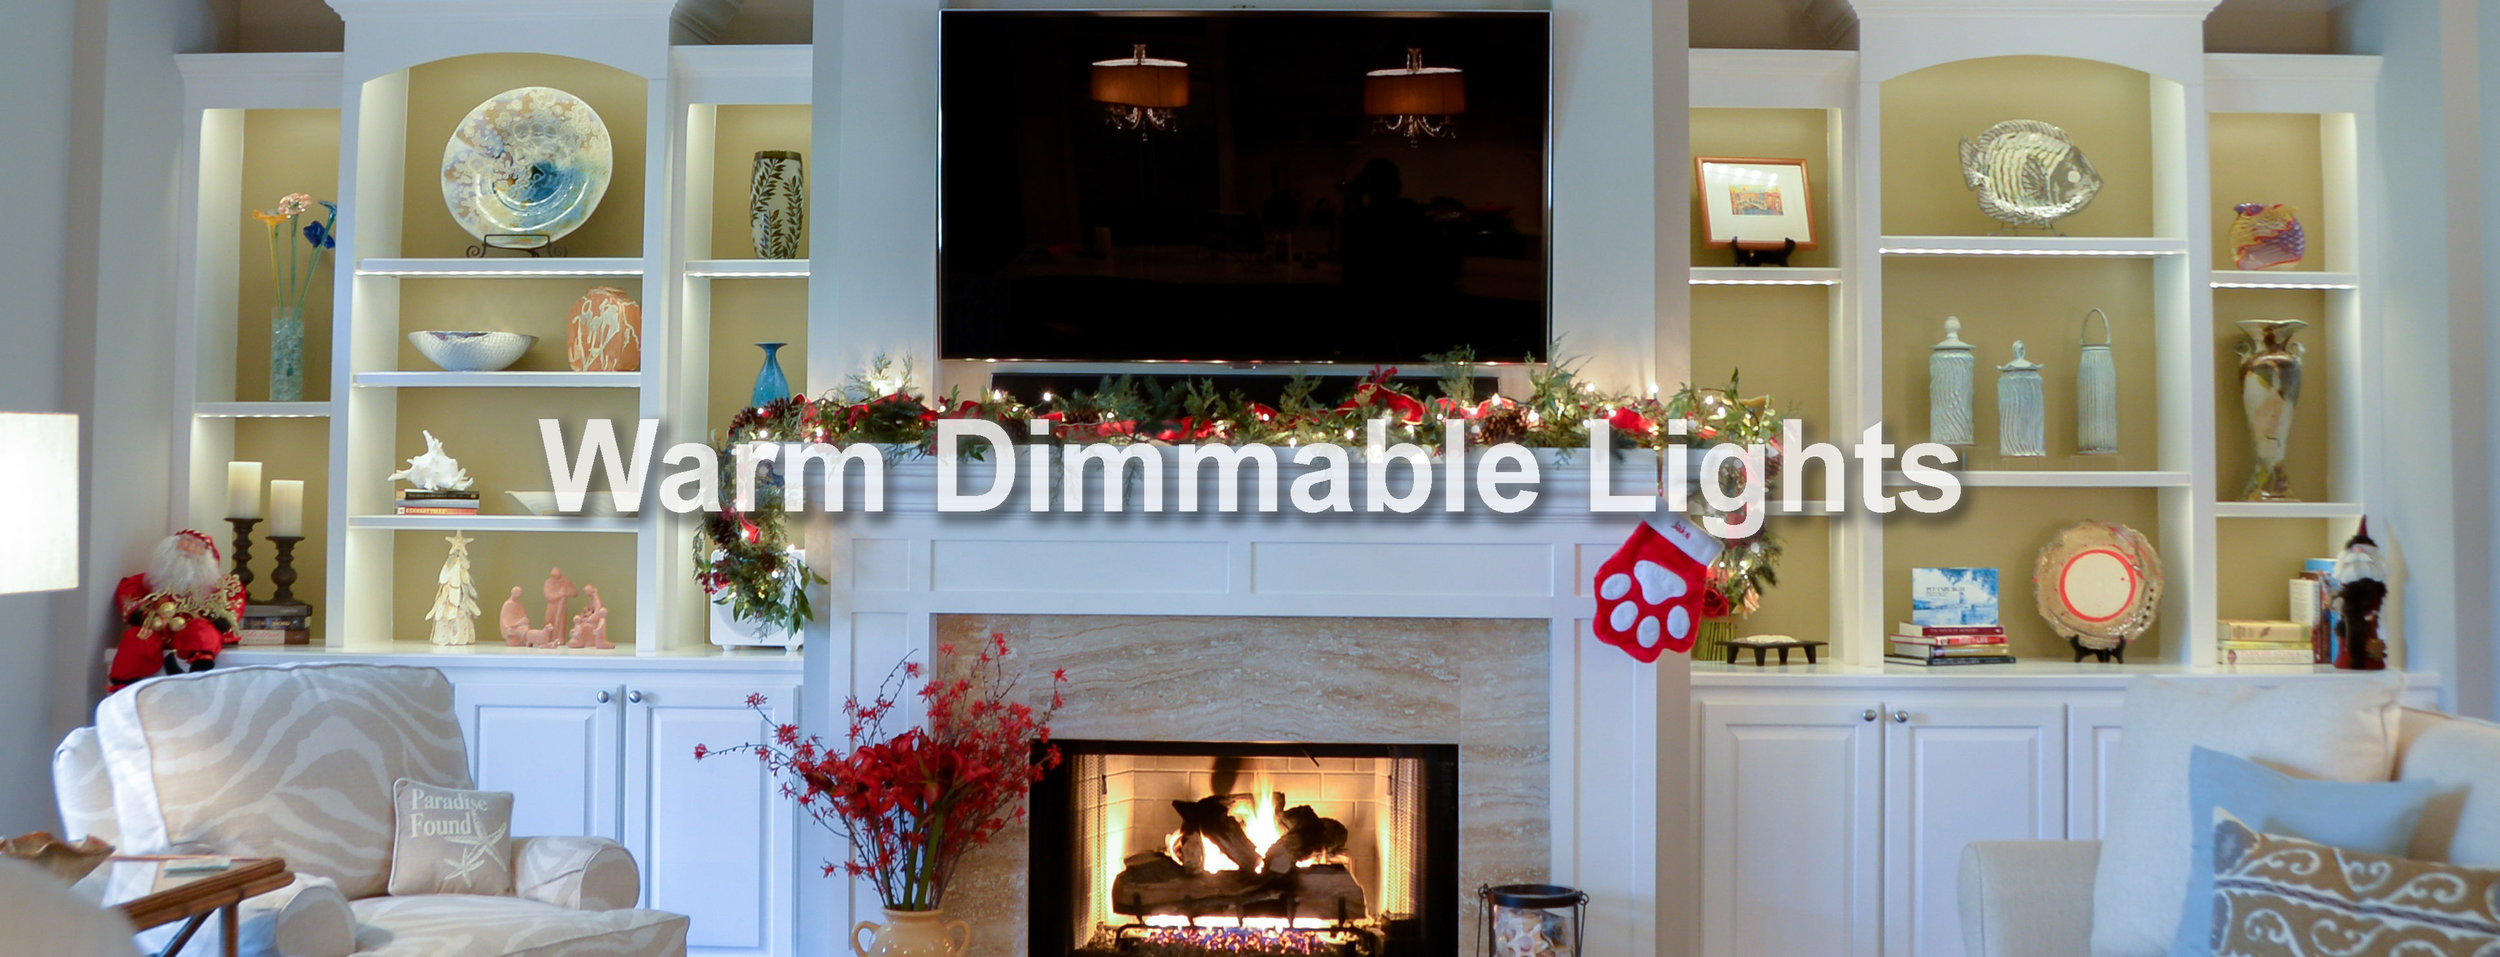 Warm, Dimmable Lights.jpg